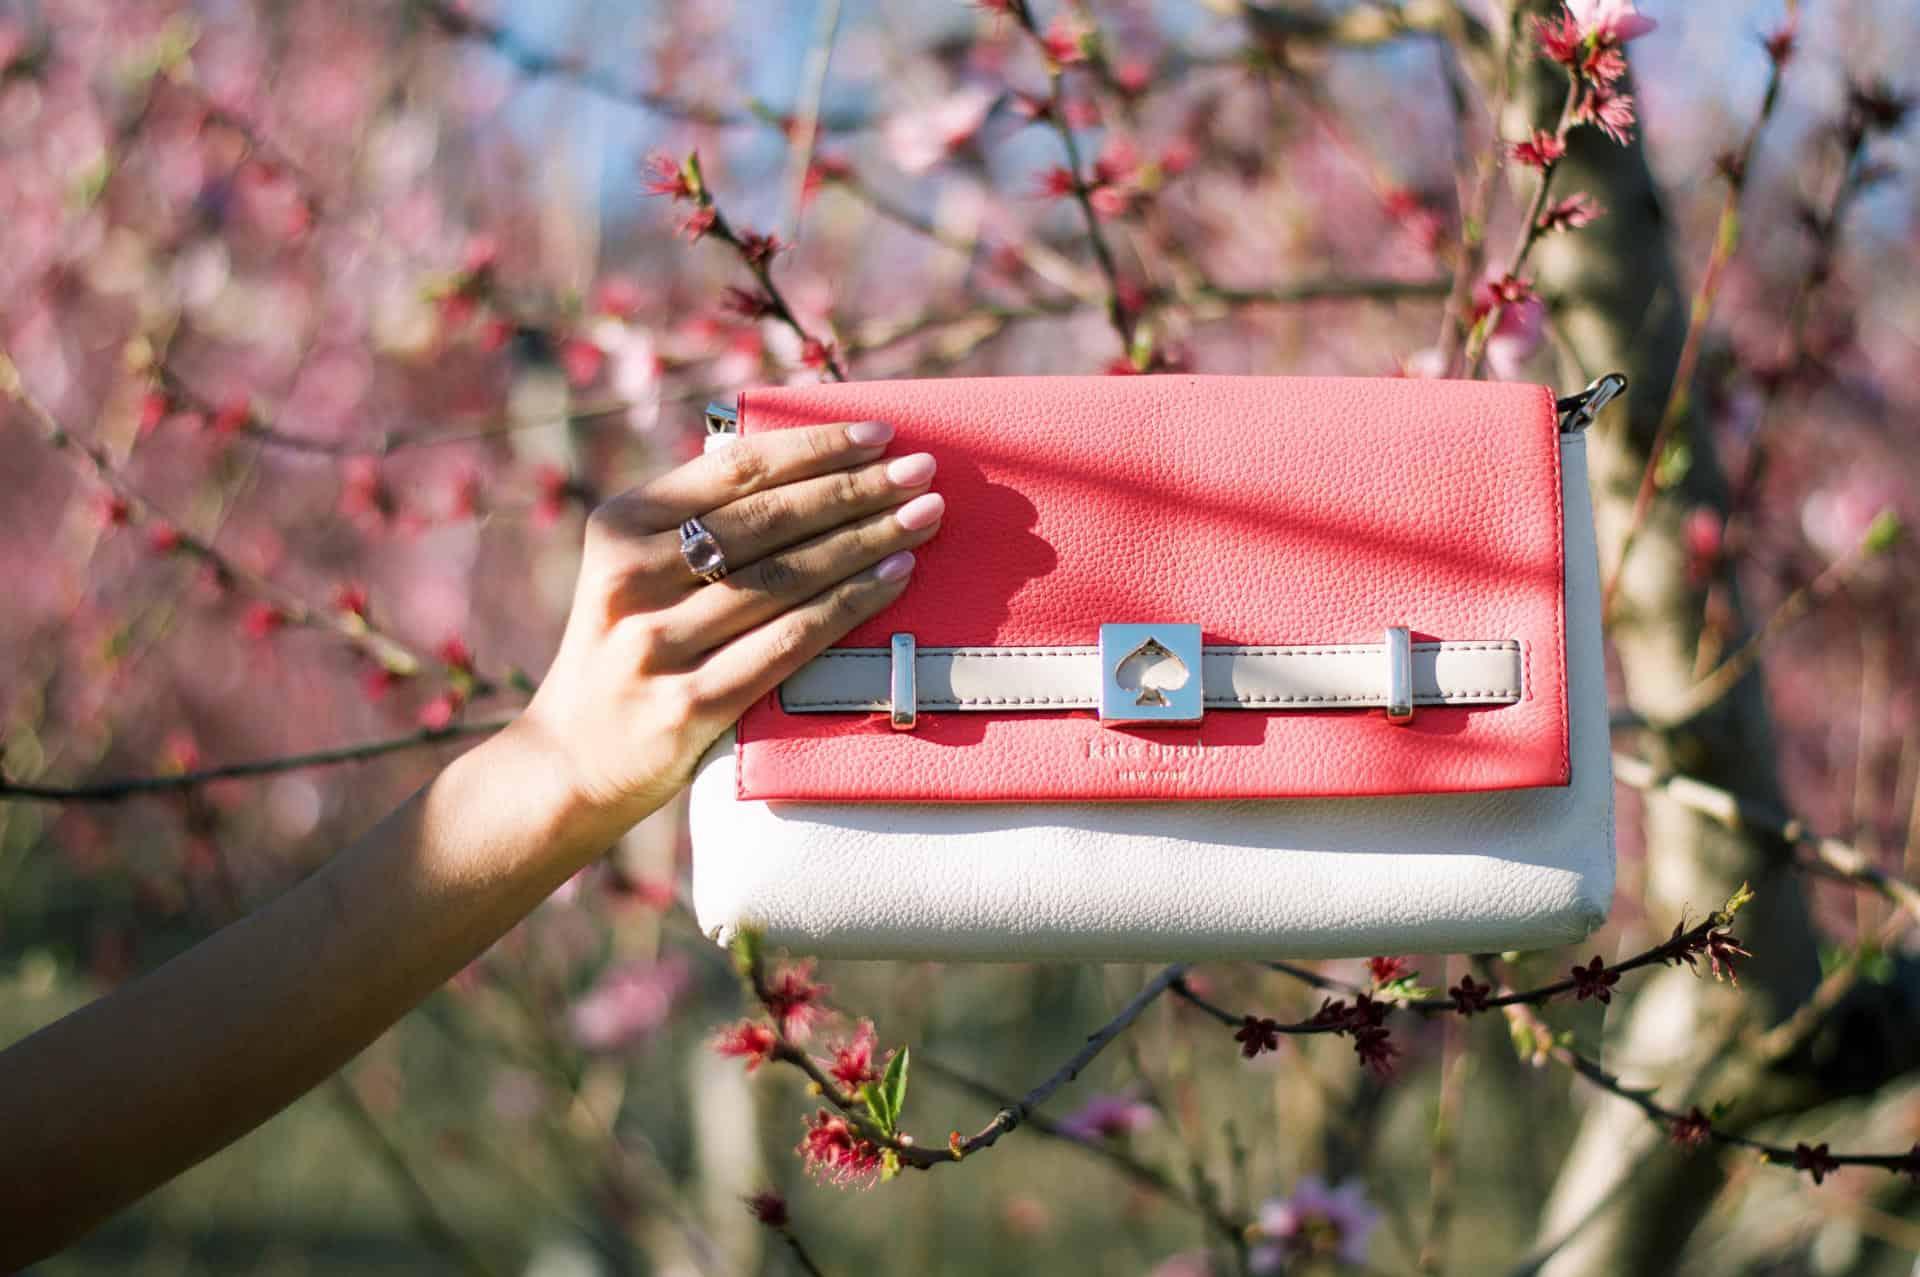 pink spring clutch